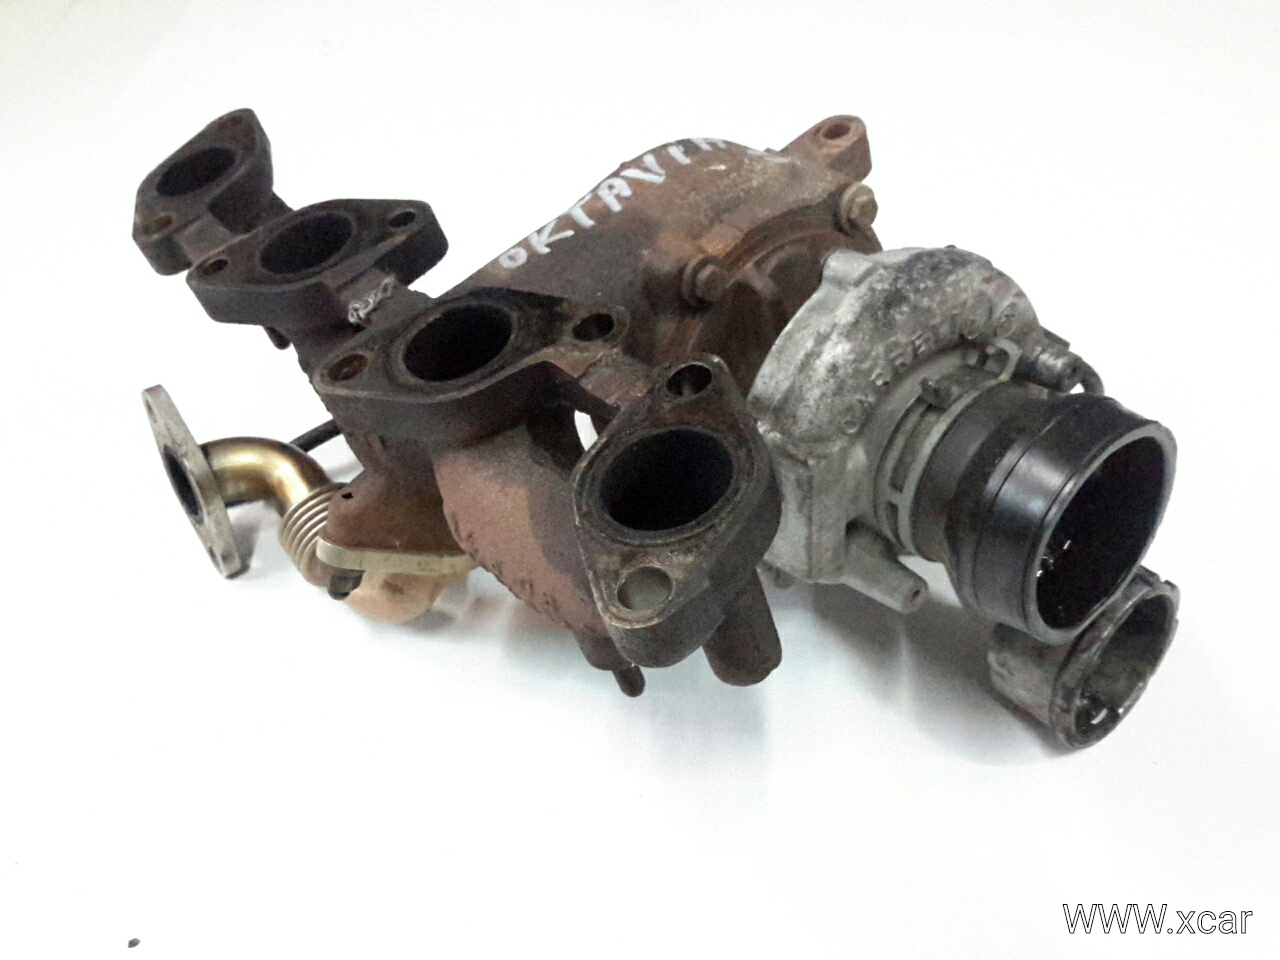 Turbo-Τουρμπίνα SKODA OCTAVIA Hatchback / 5dr 2004 - 2008 ( 5  } 2000  ( BKD  }  Diesel  140  16 valve  TDI #03G253014H